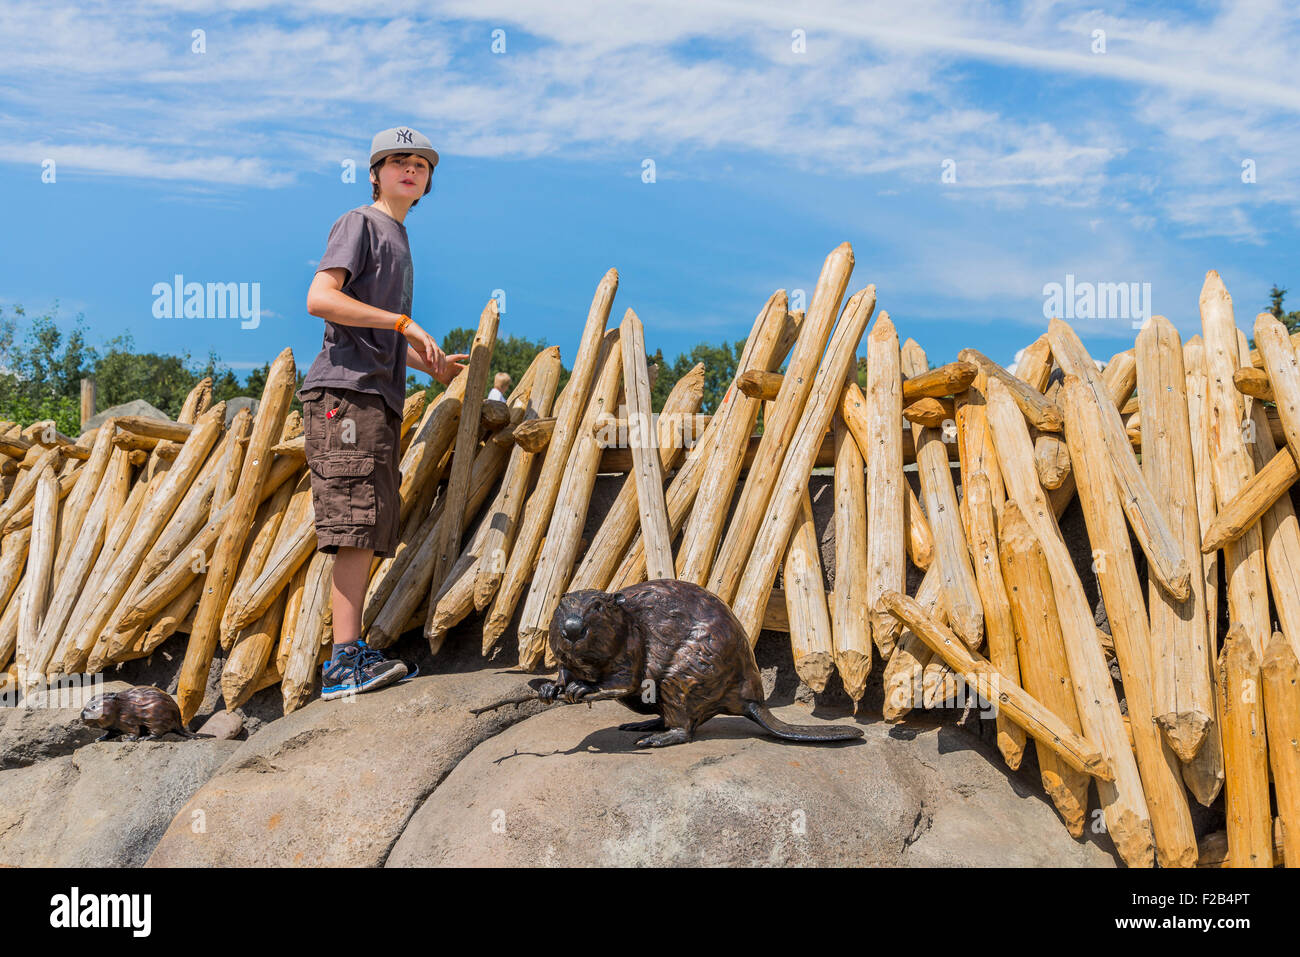 Boy at beaver lodge exhibit, Edmonton Valley Zoo, Edmonton, Alberta, Canada - Stock Image